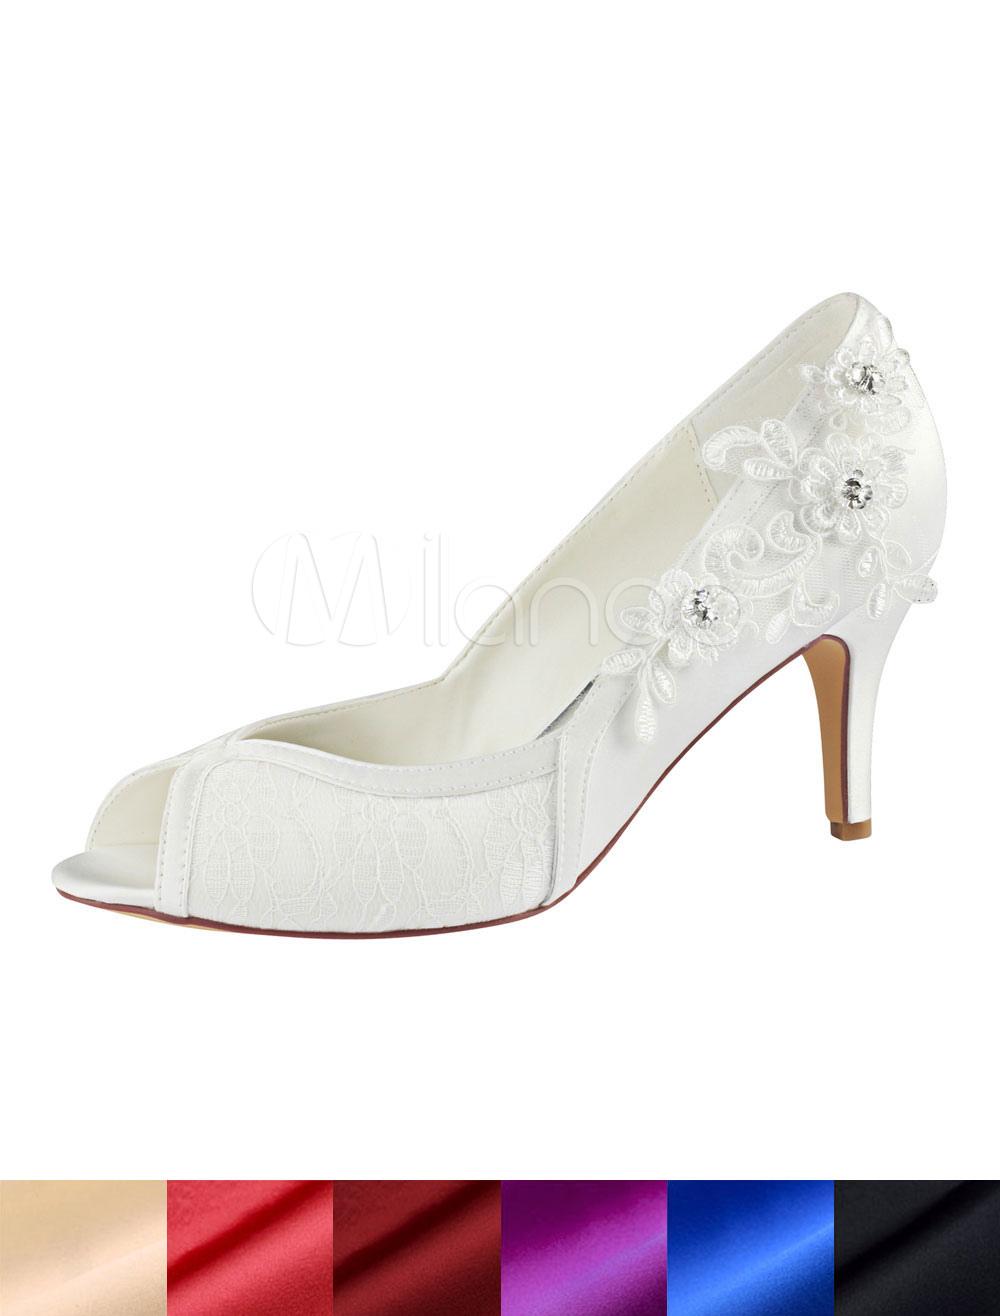 Wedding Shoes Ivory Peep Toe Lace Flowers Beaded Slip On Bridal Shoes High Heels